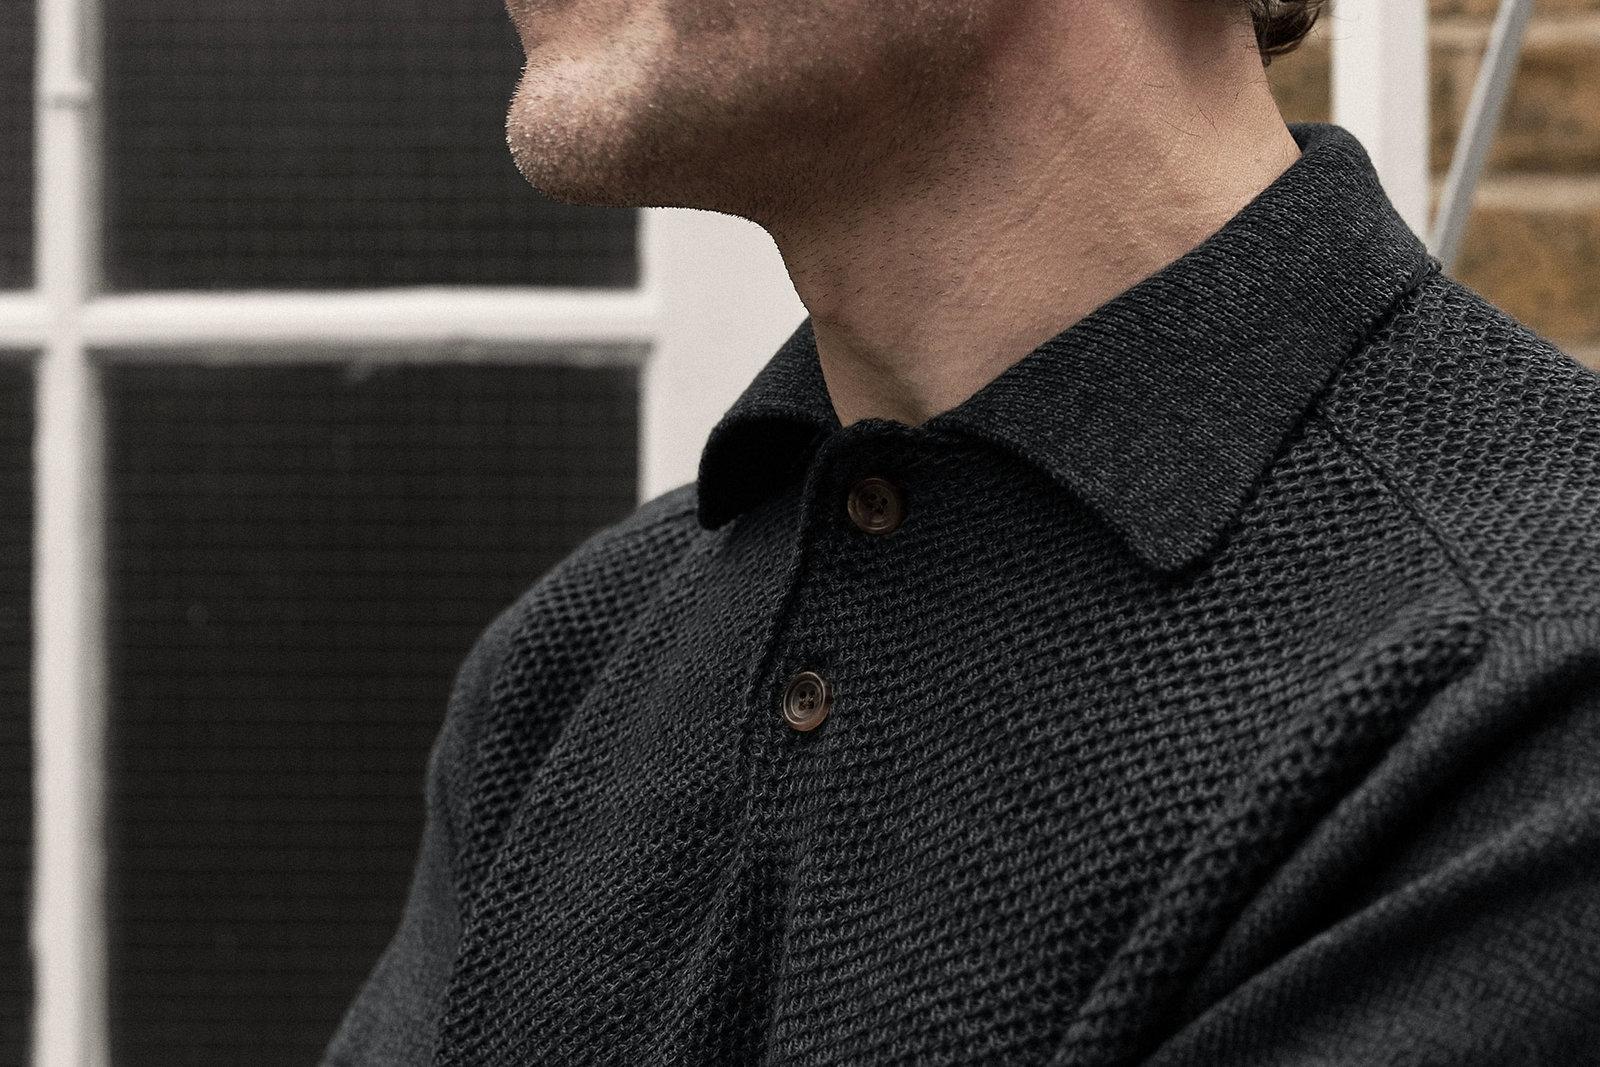 polo-shirt-cotton-charcoal-worn-4@2x.jpg